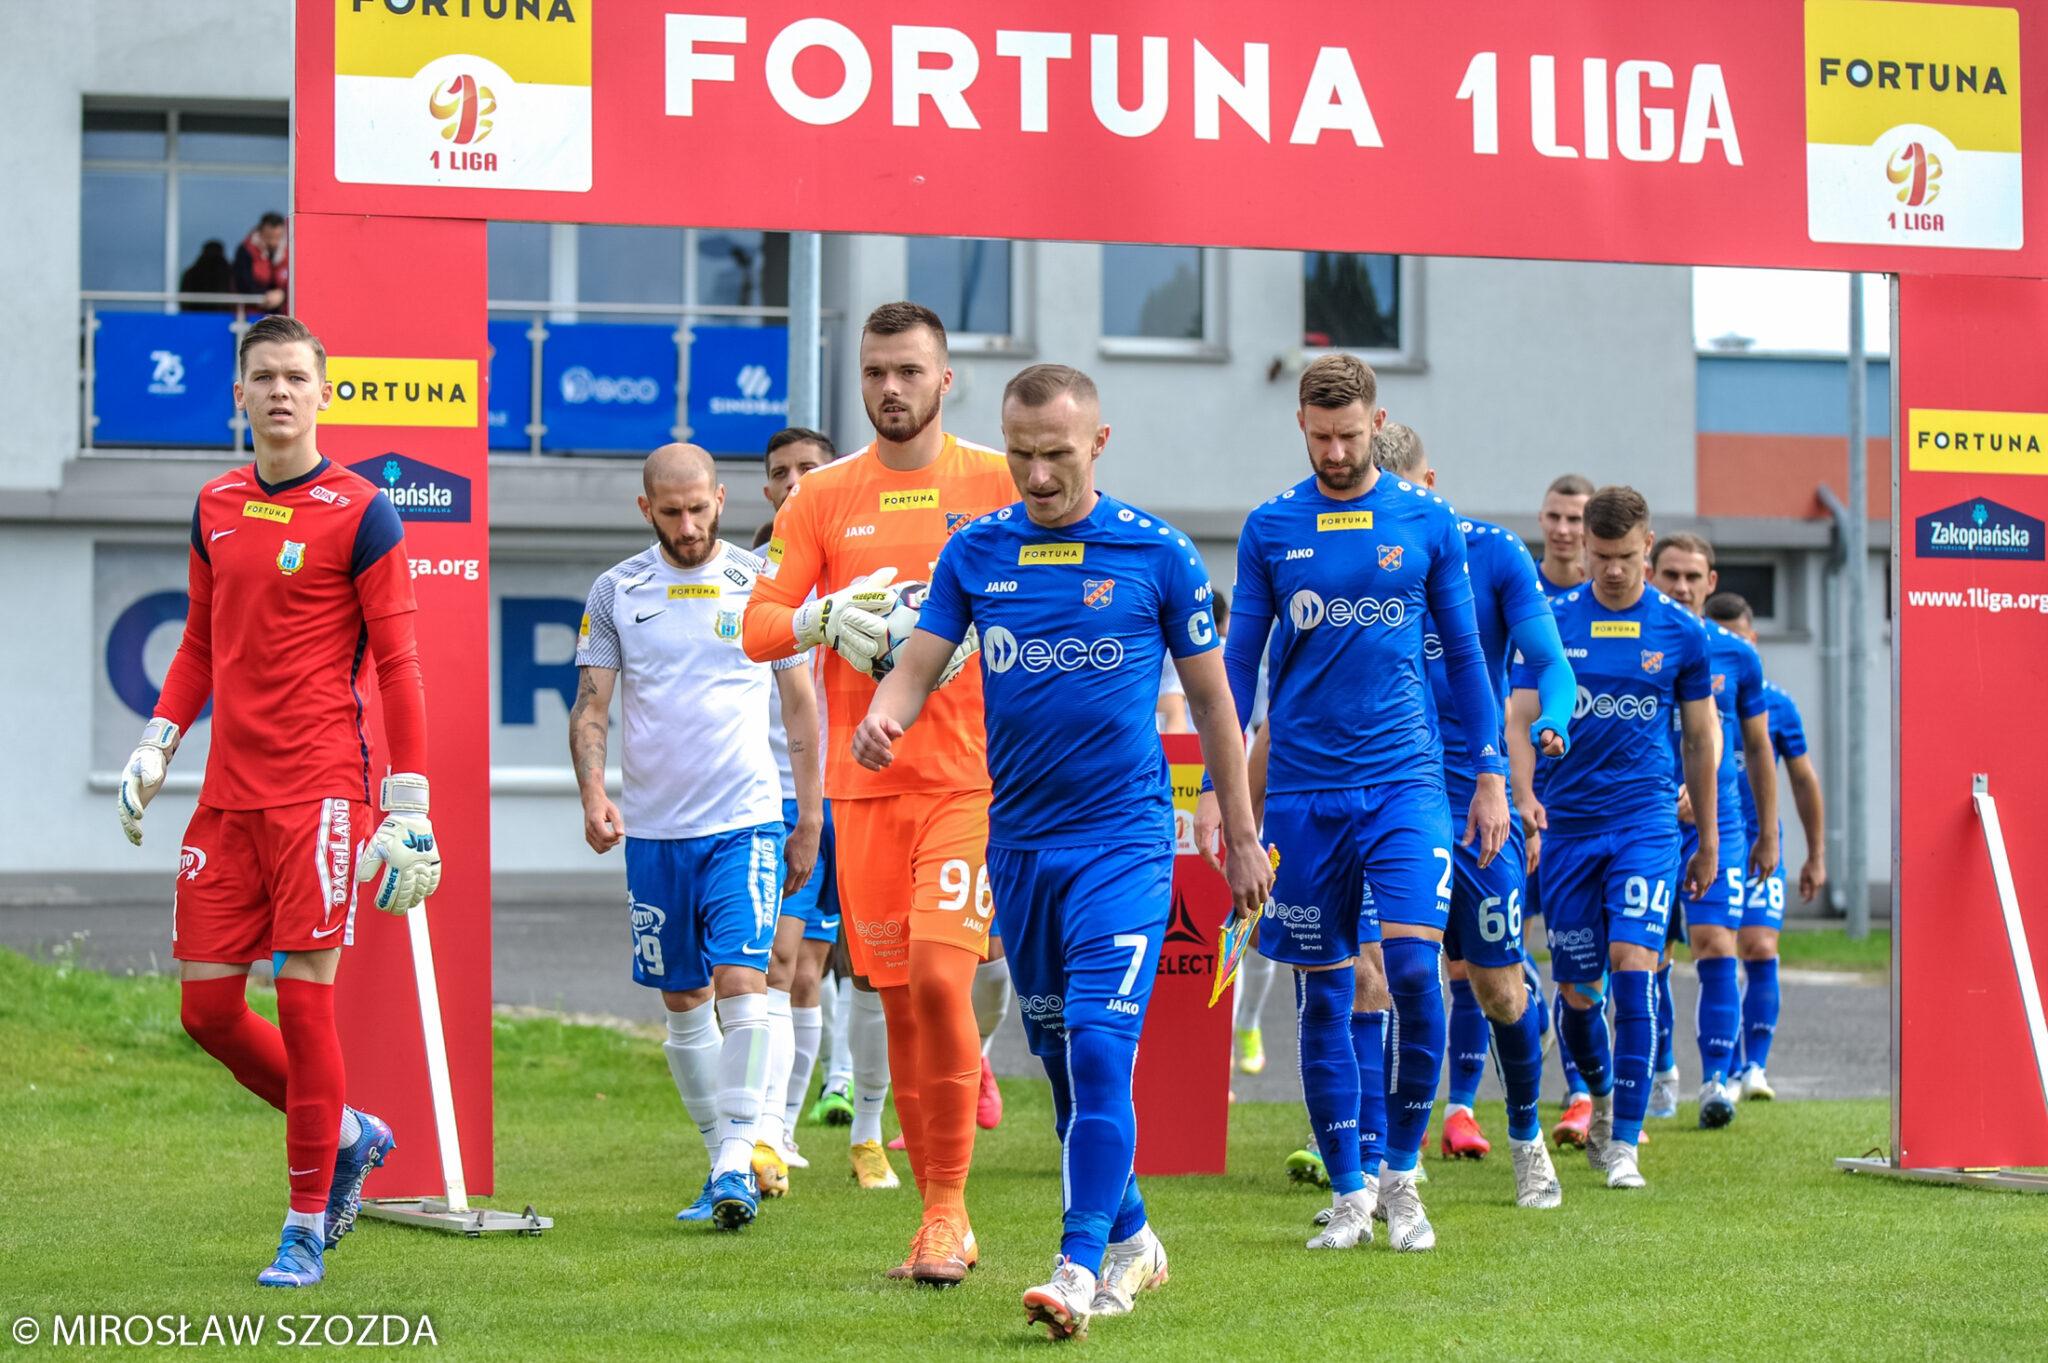 Terminy spotkań 16. i 17. kolejki Fortuna 1 Liga